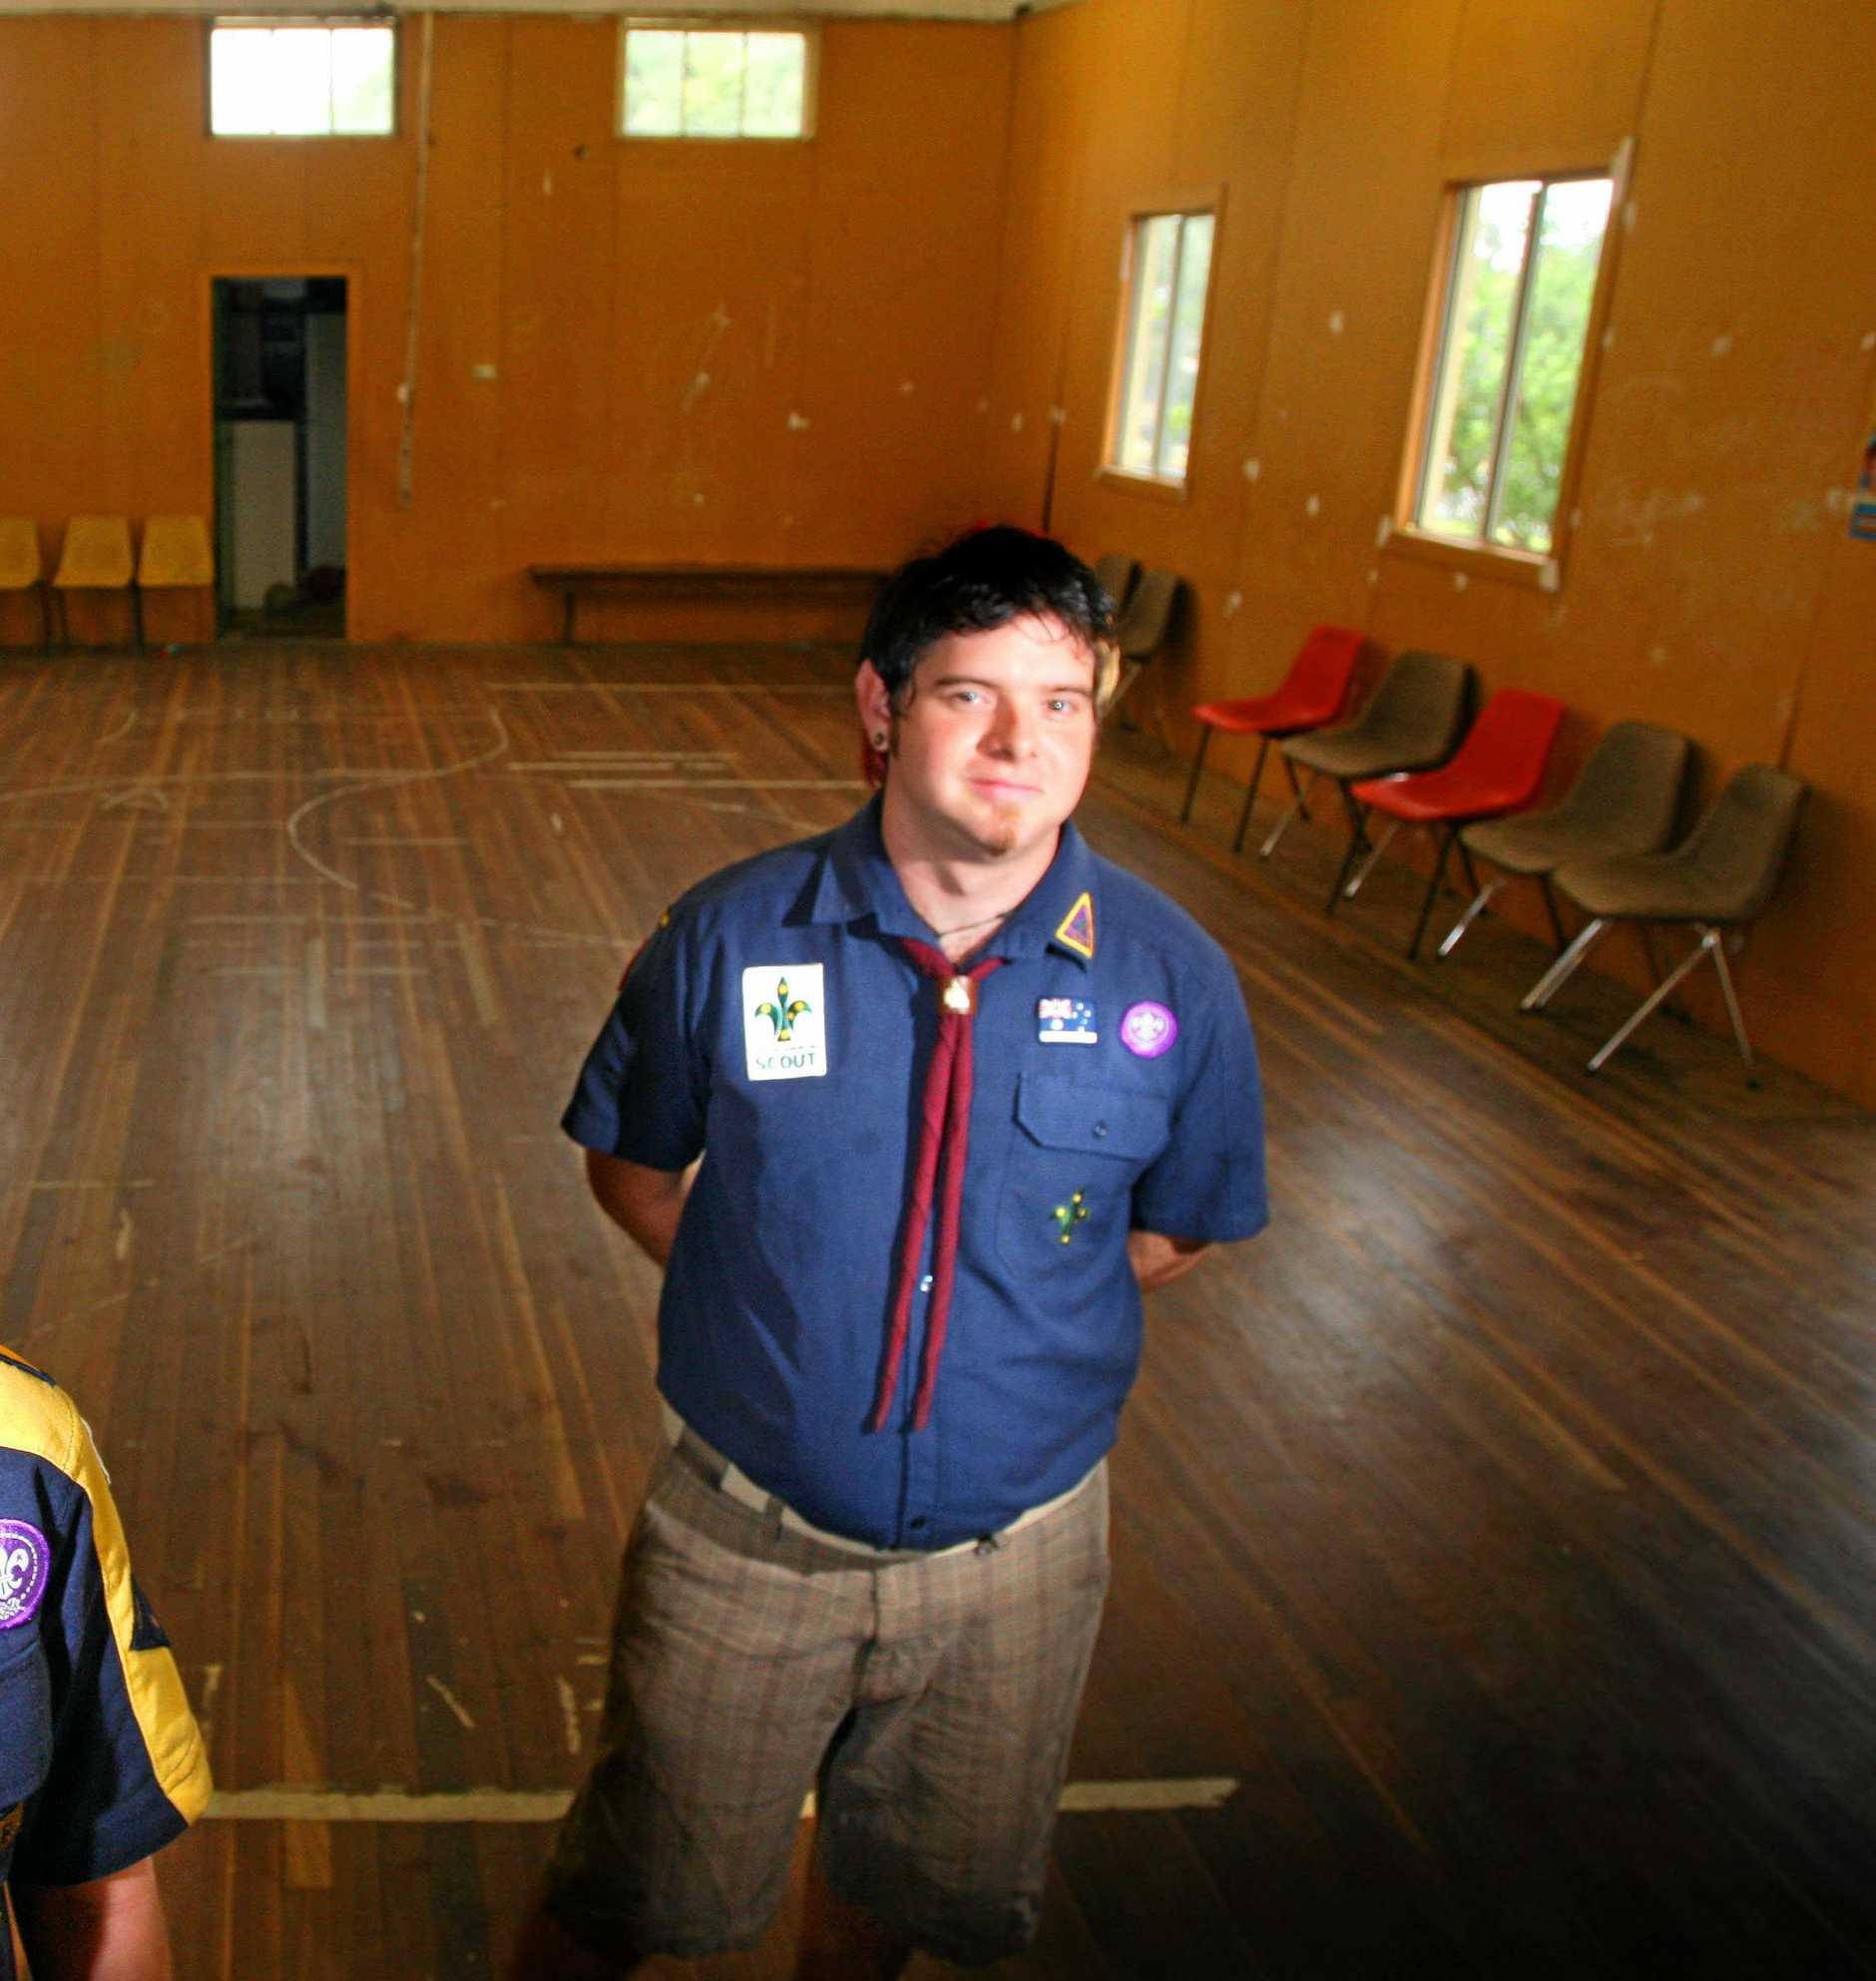 Scouts Cub leader Brock Emil Dittman.